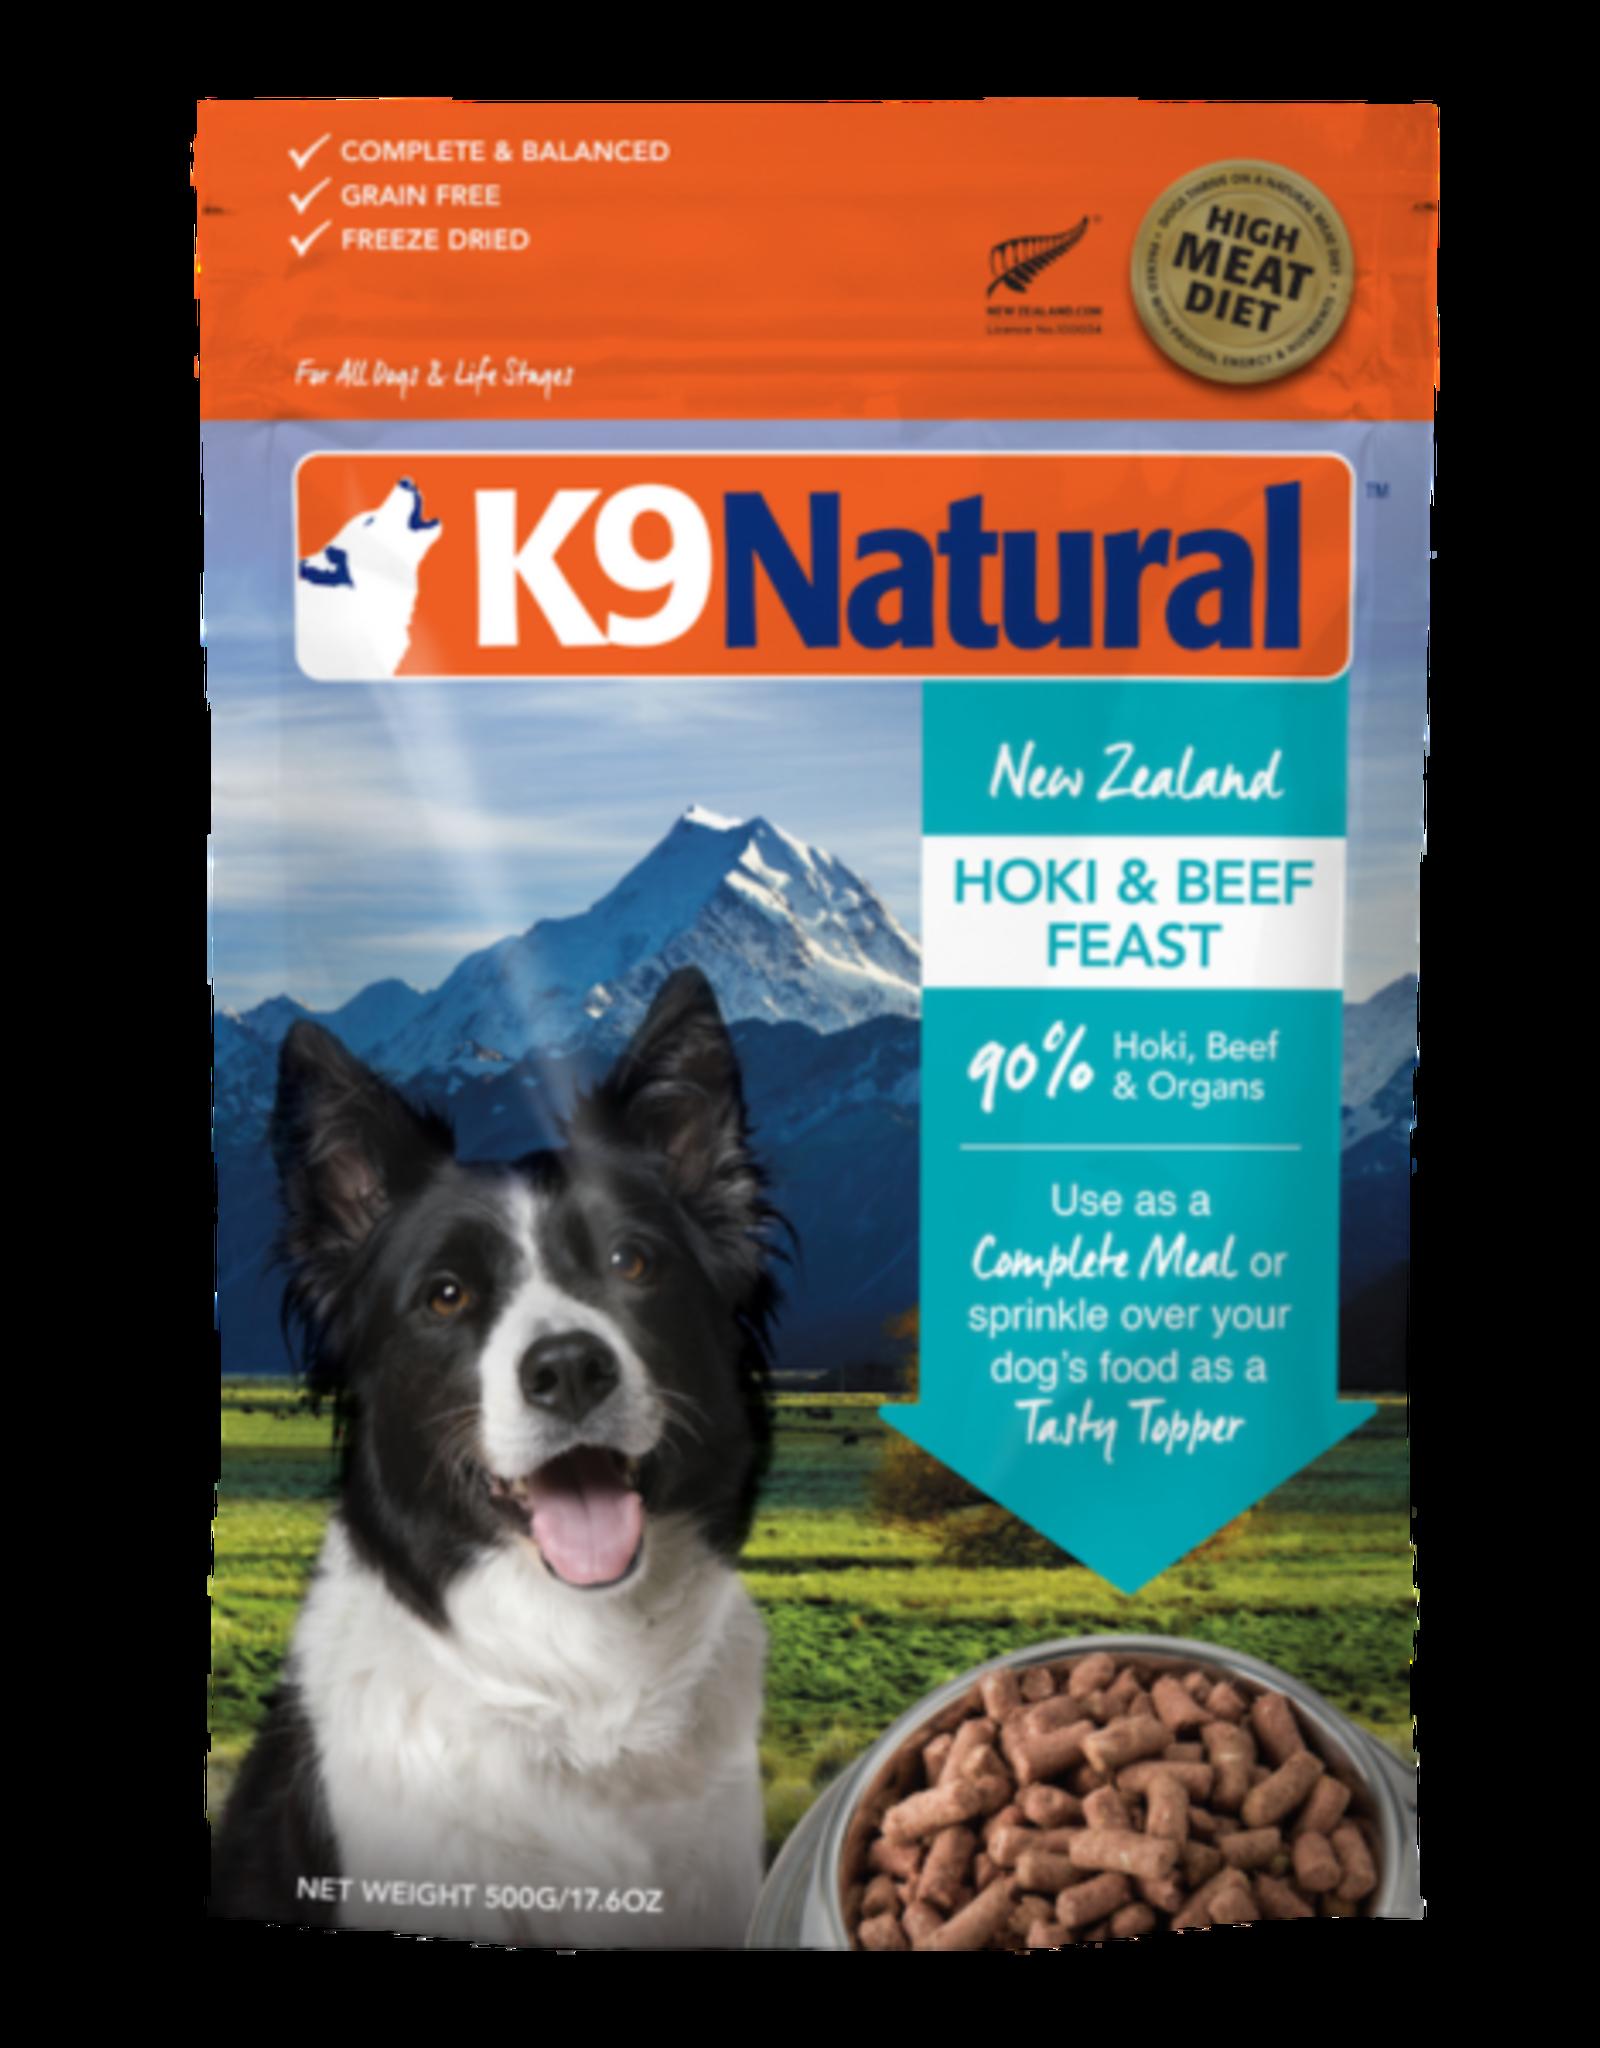 K9 Natural K9 Natural Freeze Dried Hoki & Beef Feast 1.1lb